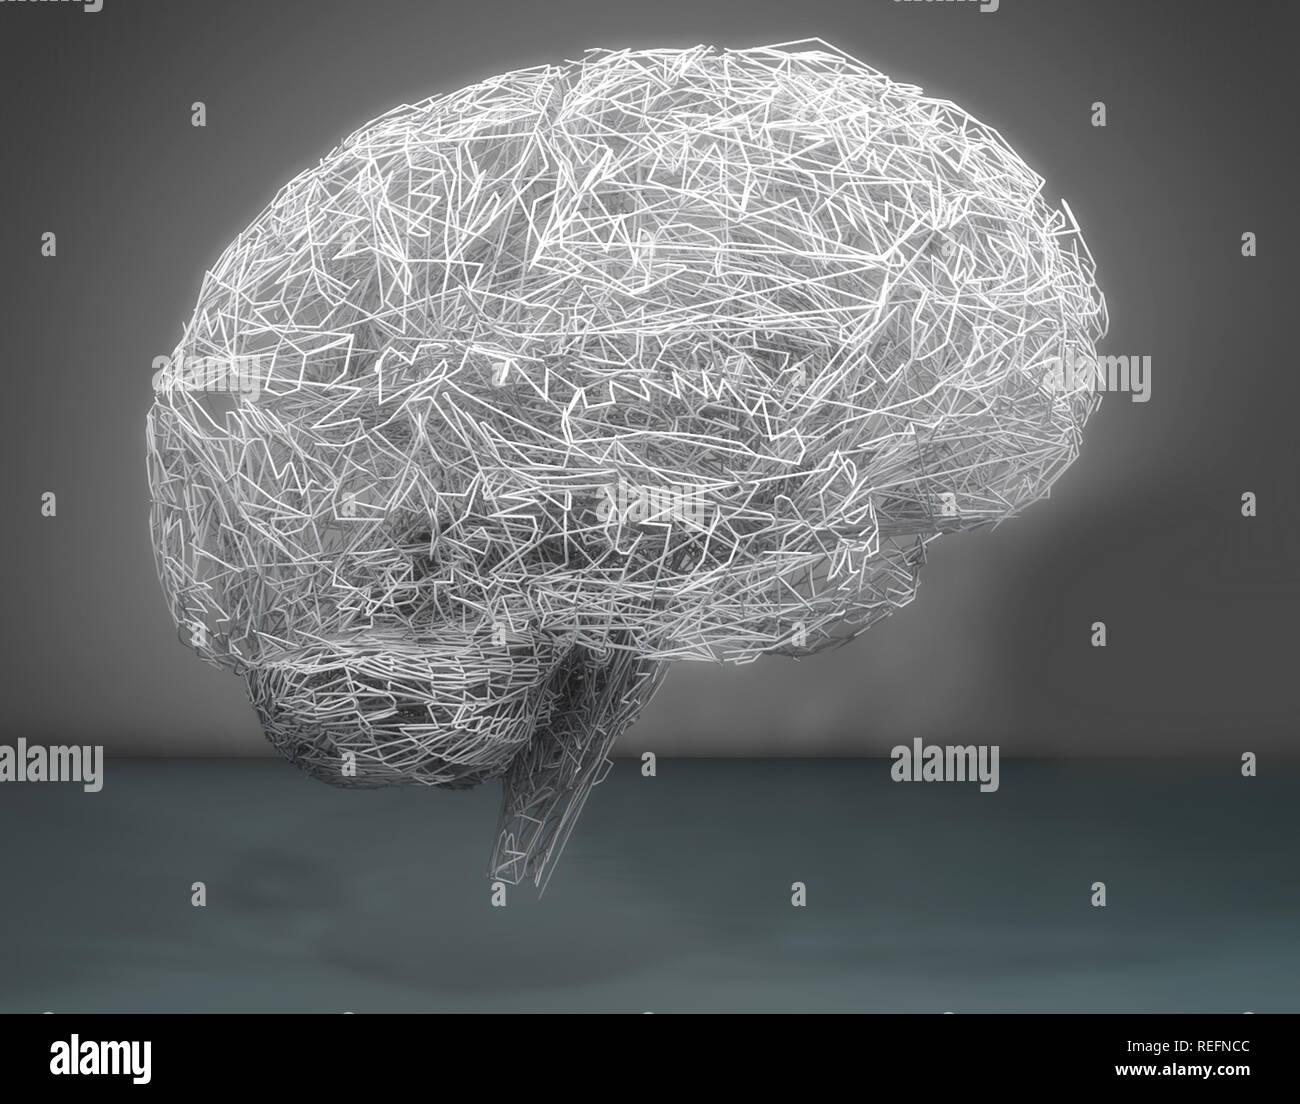 3d brain illustration - Stock Image